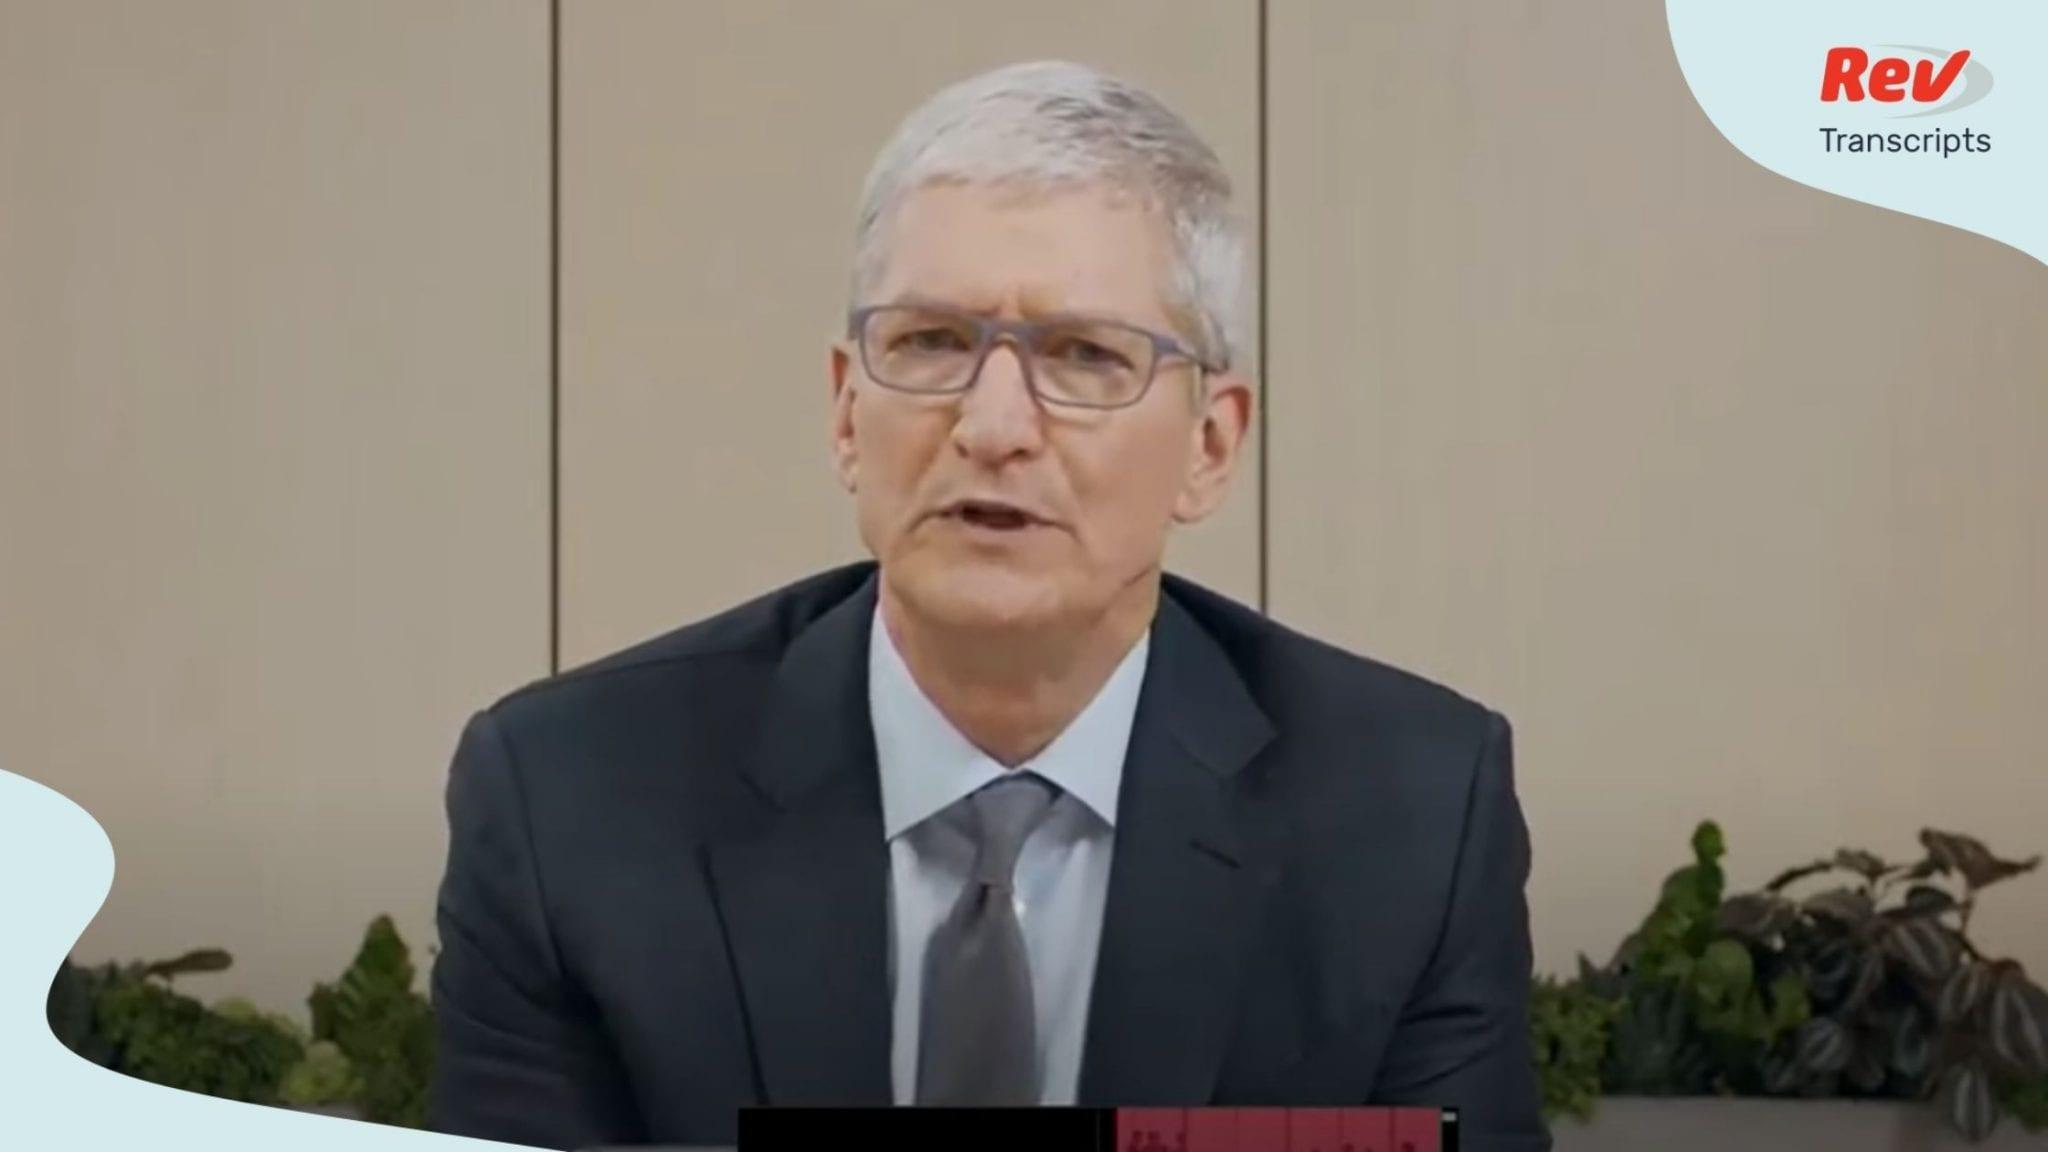 Tim Cook Opening Statement Transcript Antitrust Hearing July 29